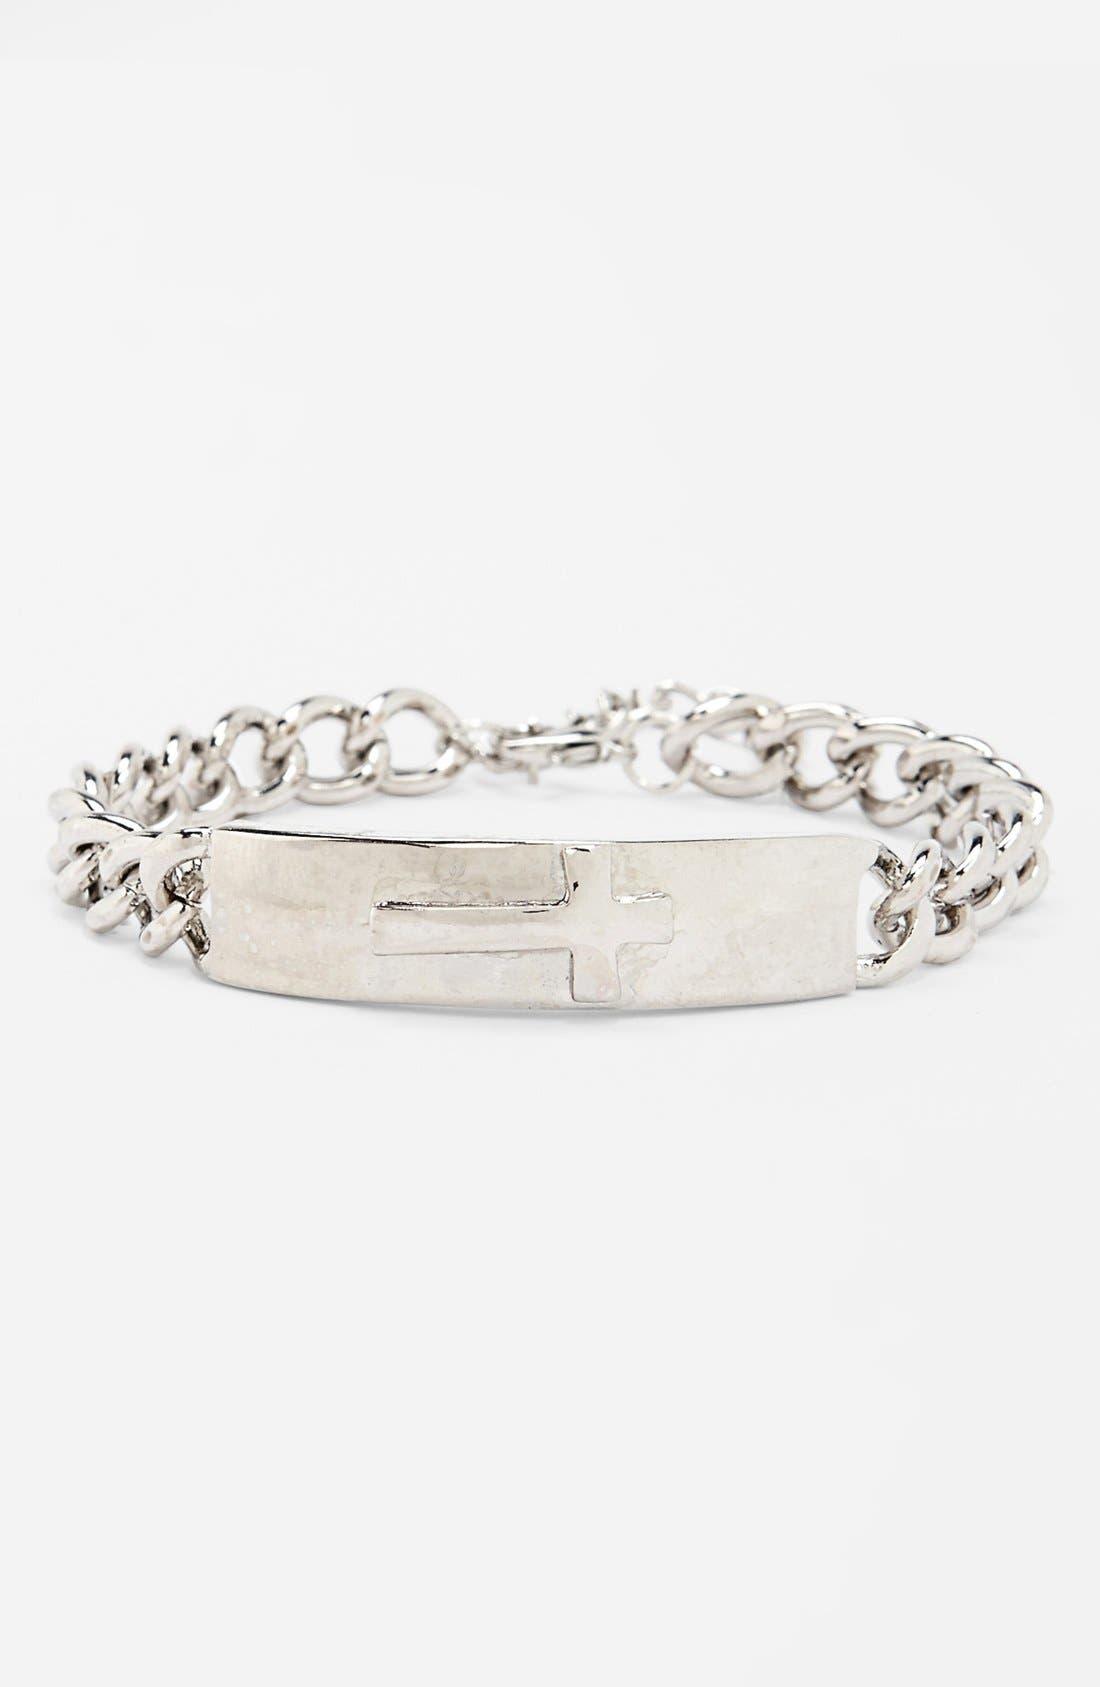 Alternate Image 1 Selected - Kool Konnections Chain ID Bracelet (Juniors) (Online Only)